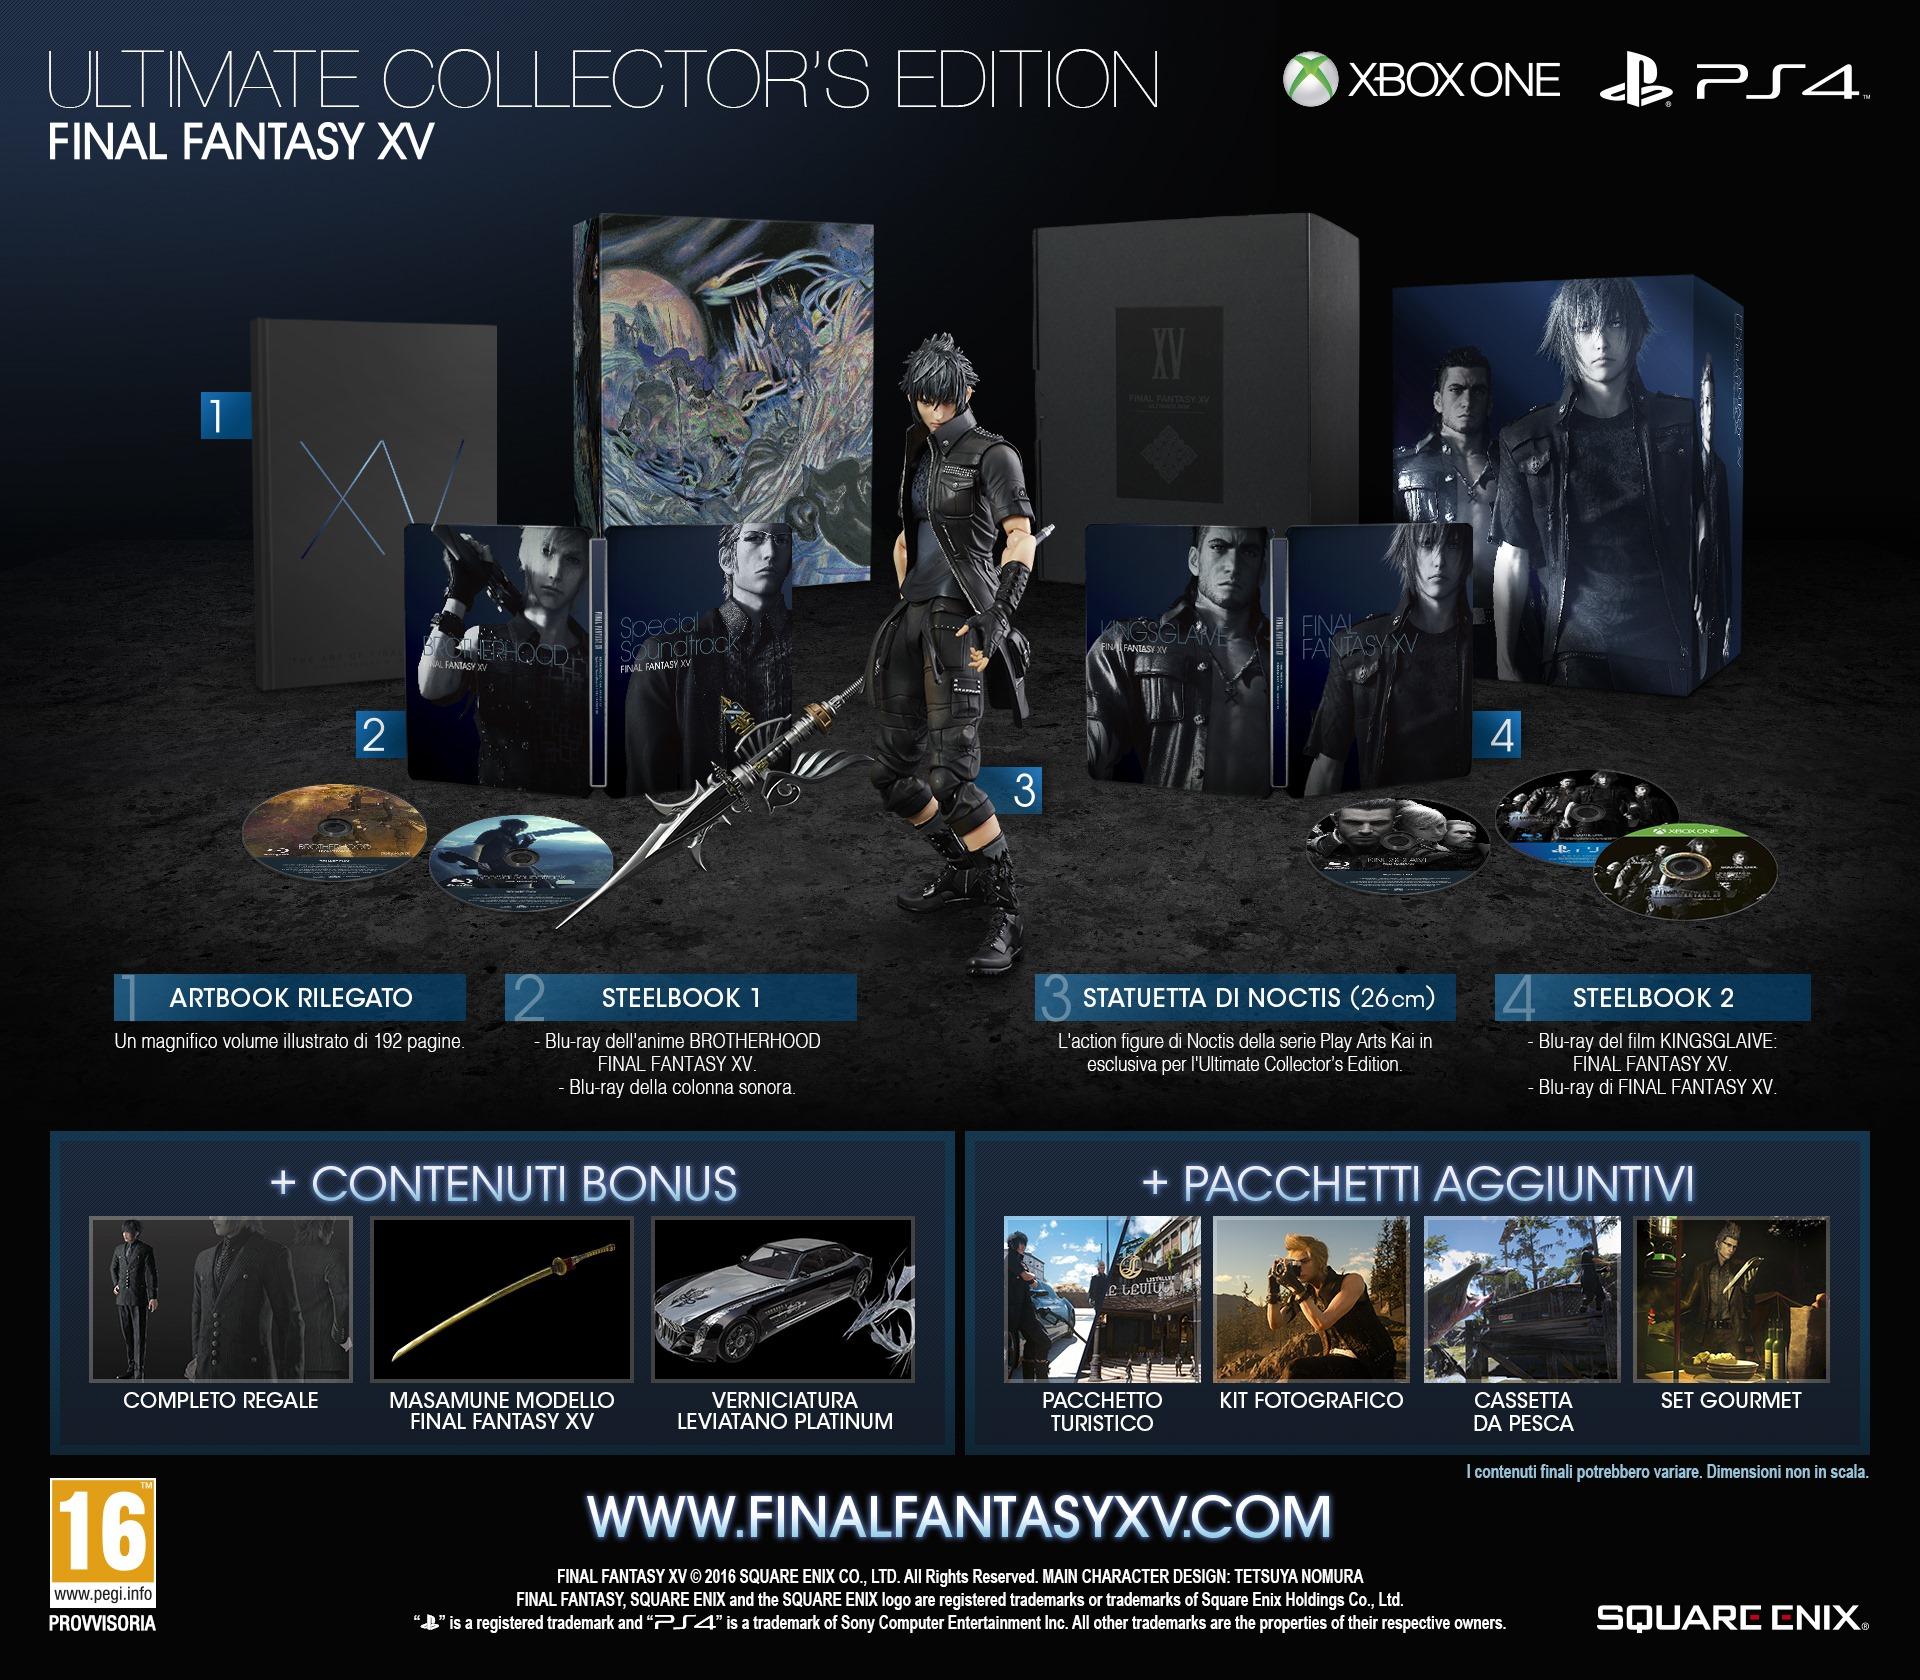 Final Fantasy XV: Ultimate Collector's Edition!